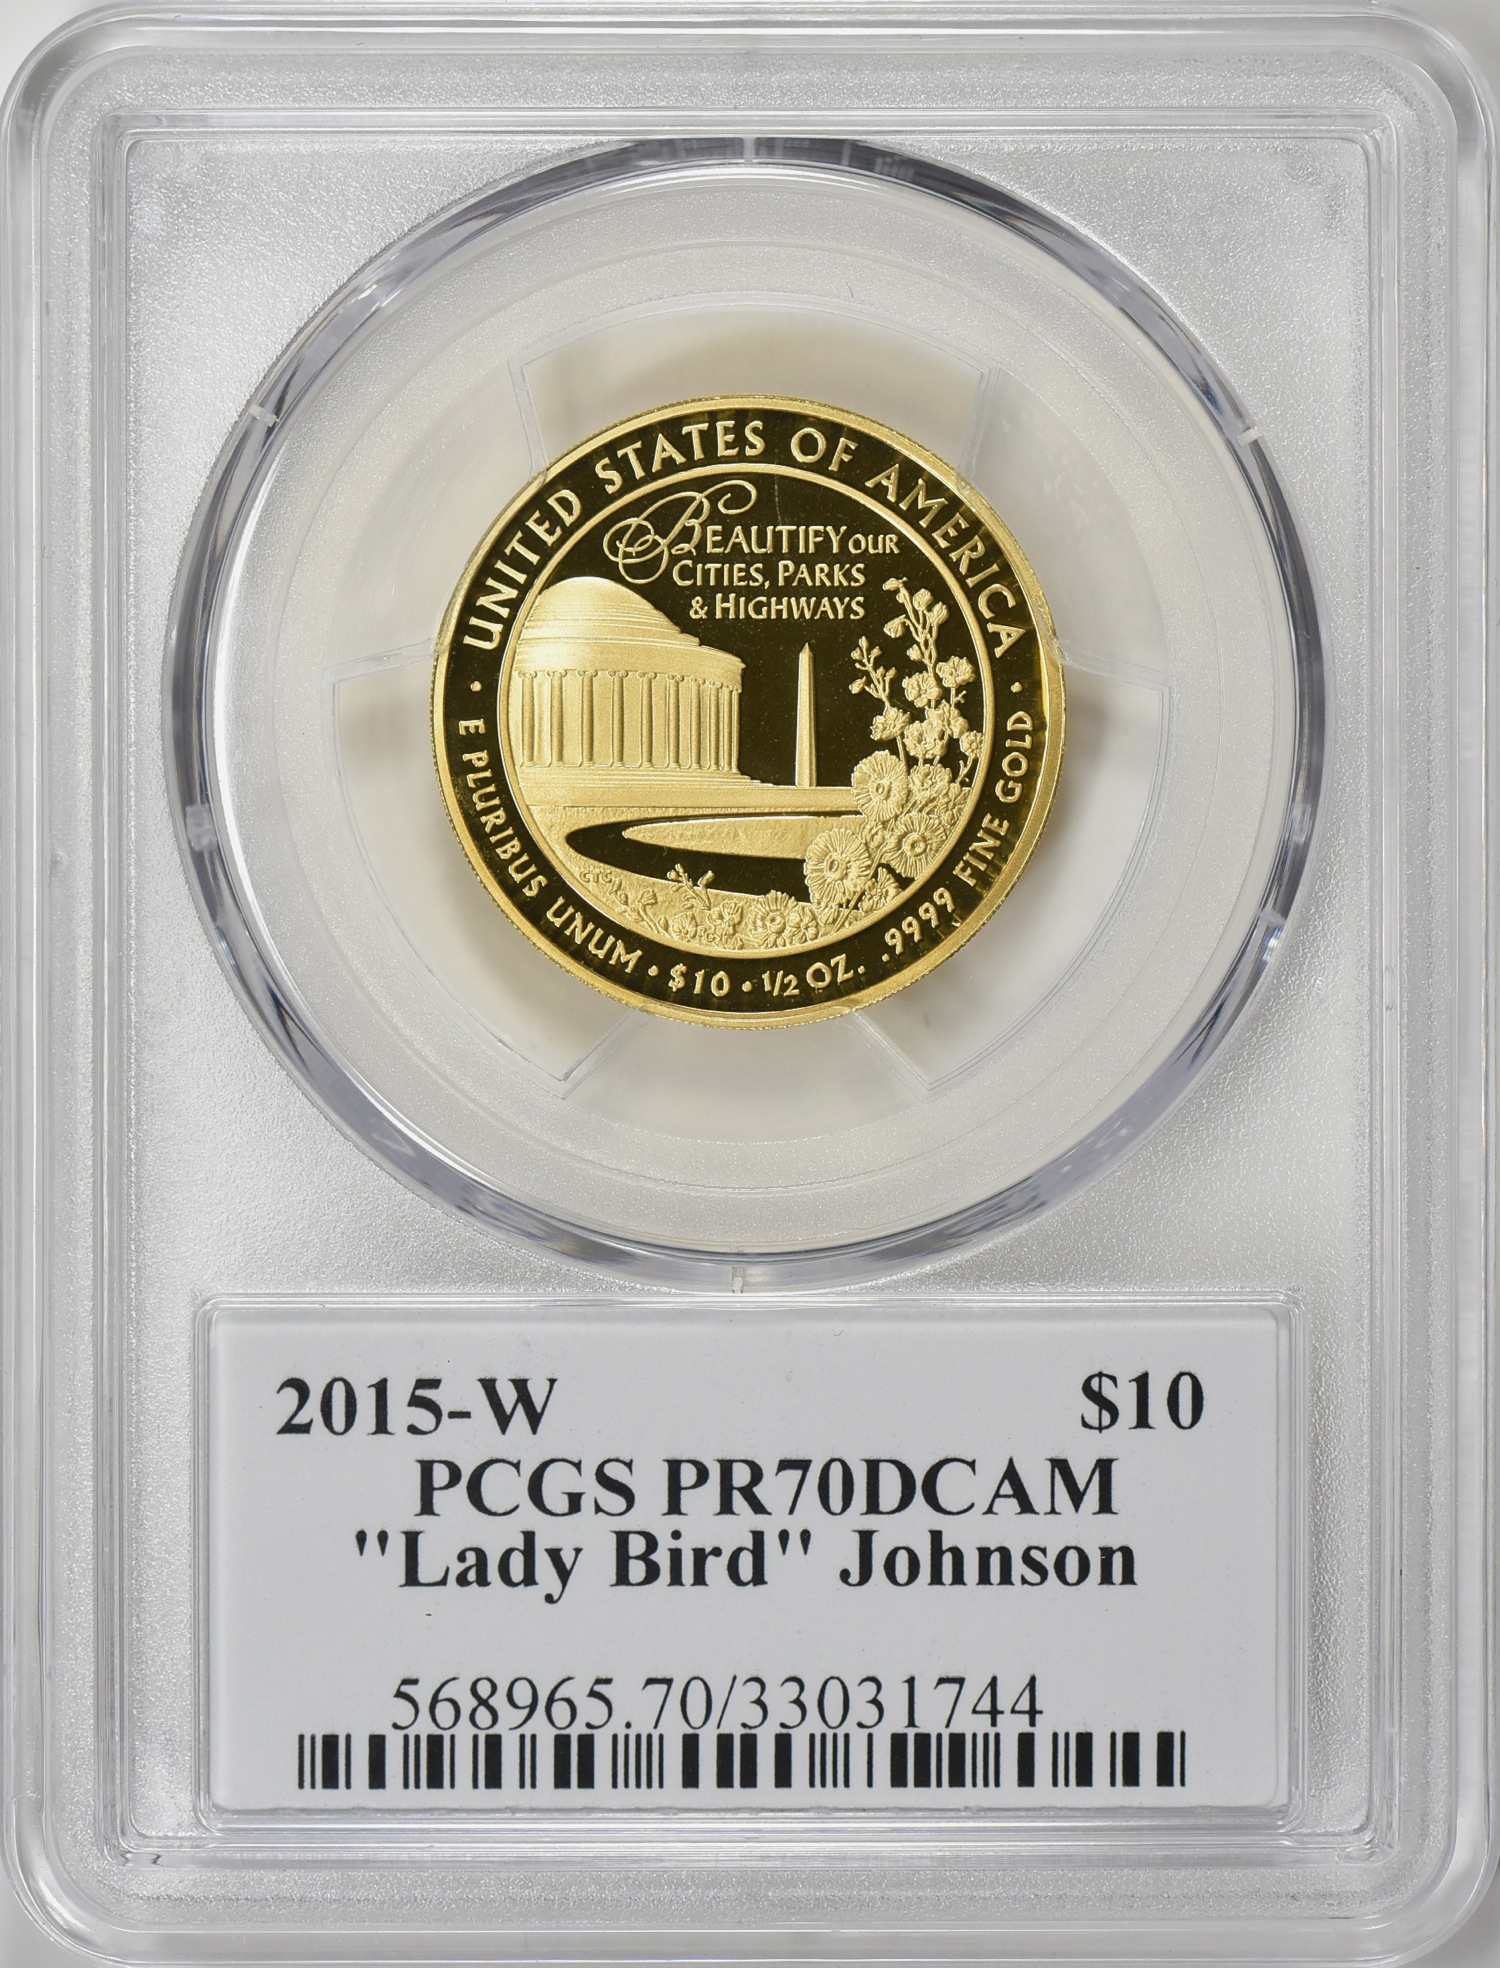 2015-W 10ドル金貨 レディーバード ジョンソン PCGS PR70DCAM John Mercantiサイン入り